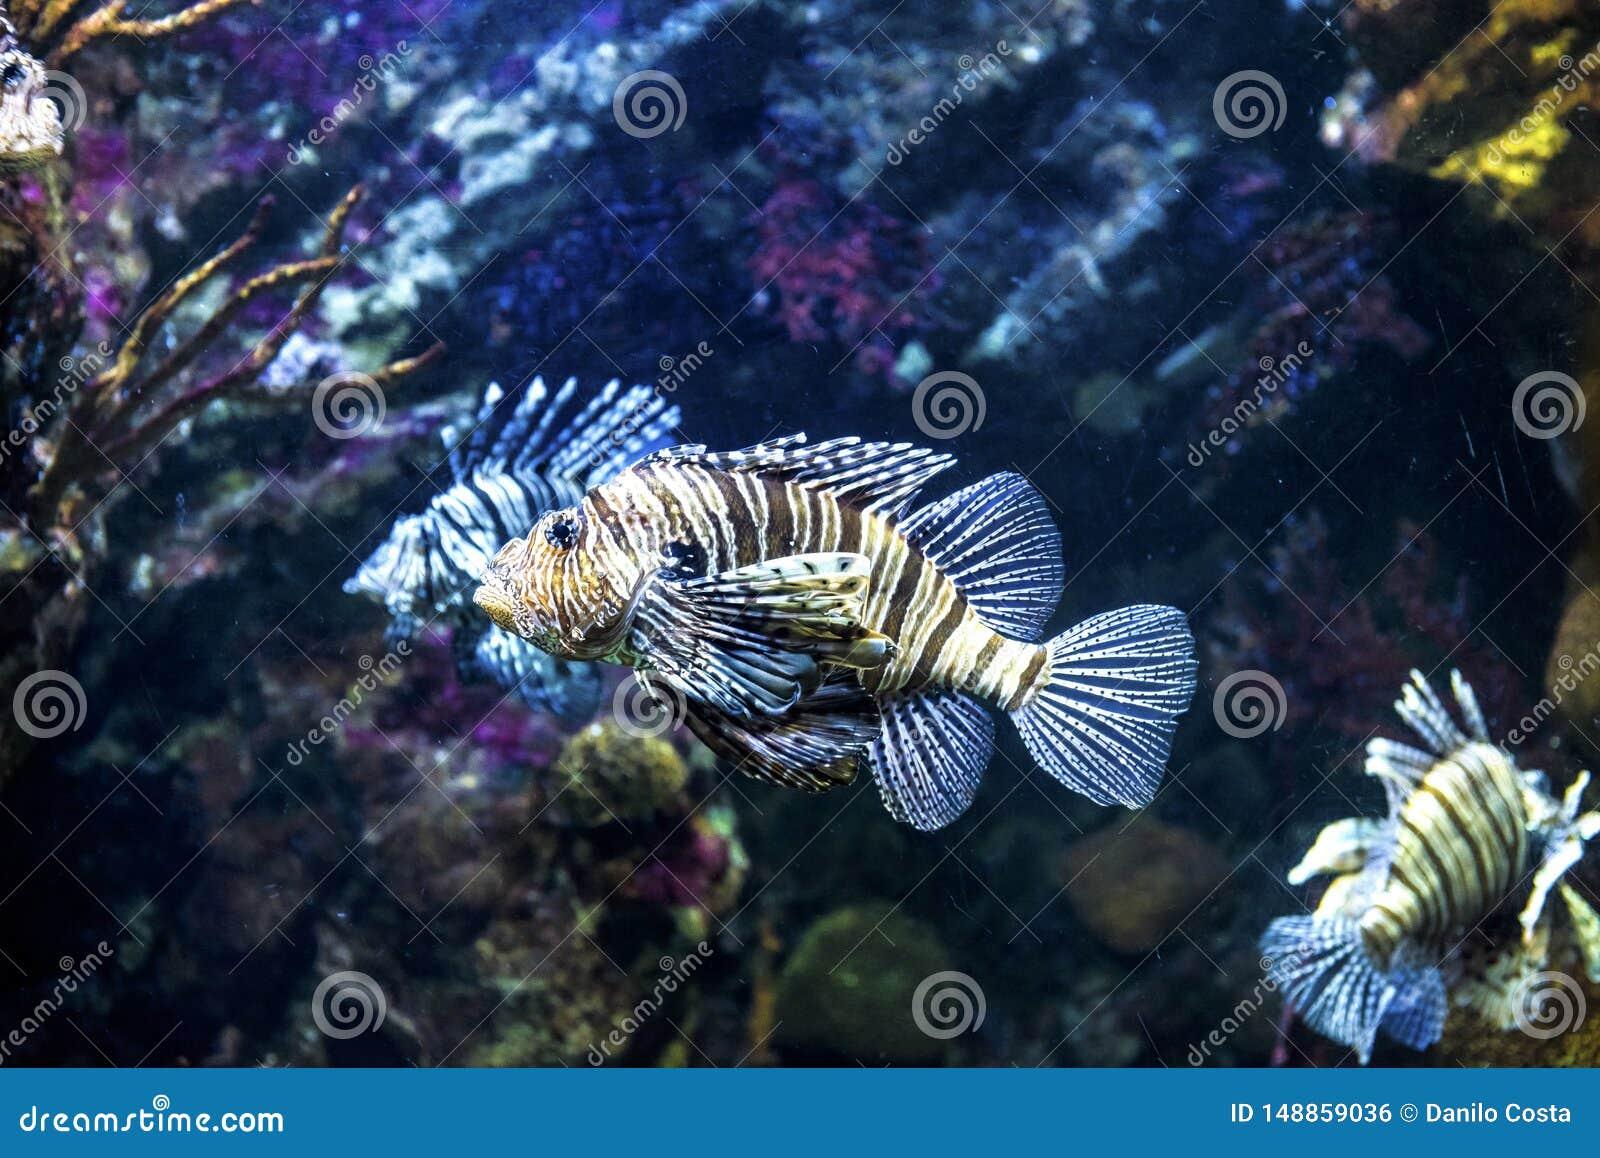 Barcelone Espagne, aquarium de poissons de scorpion